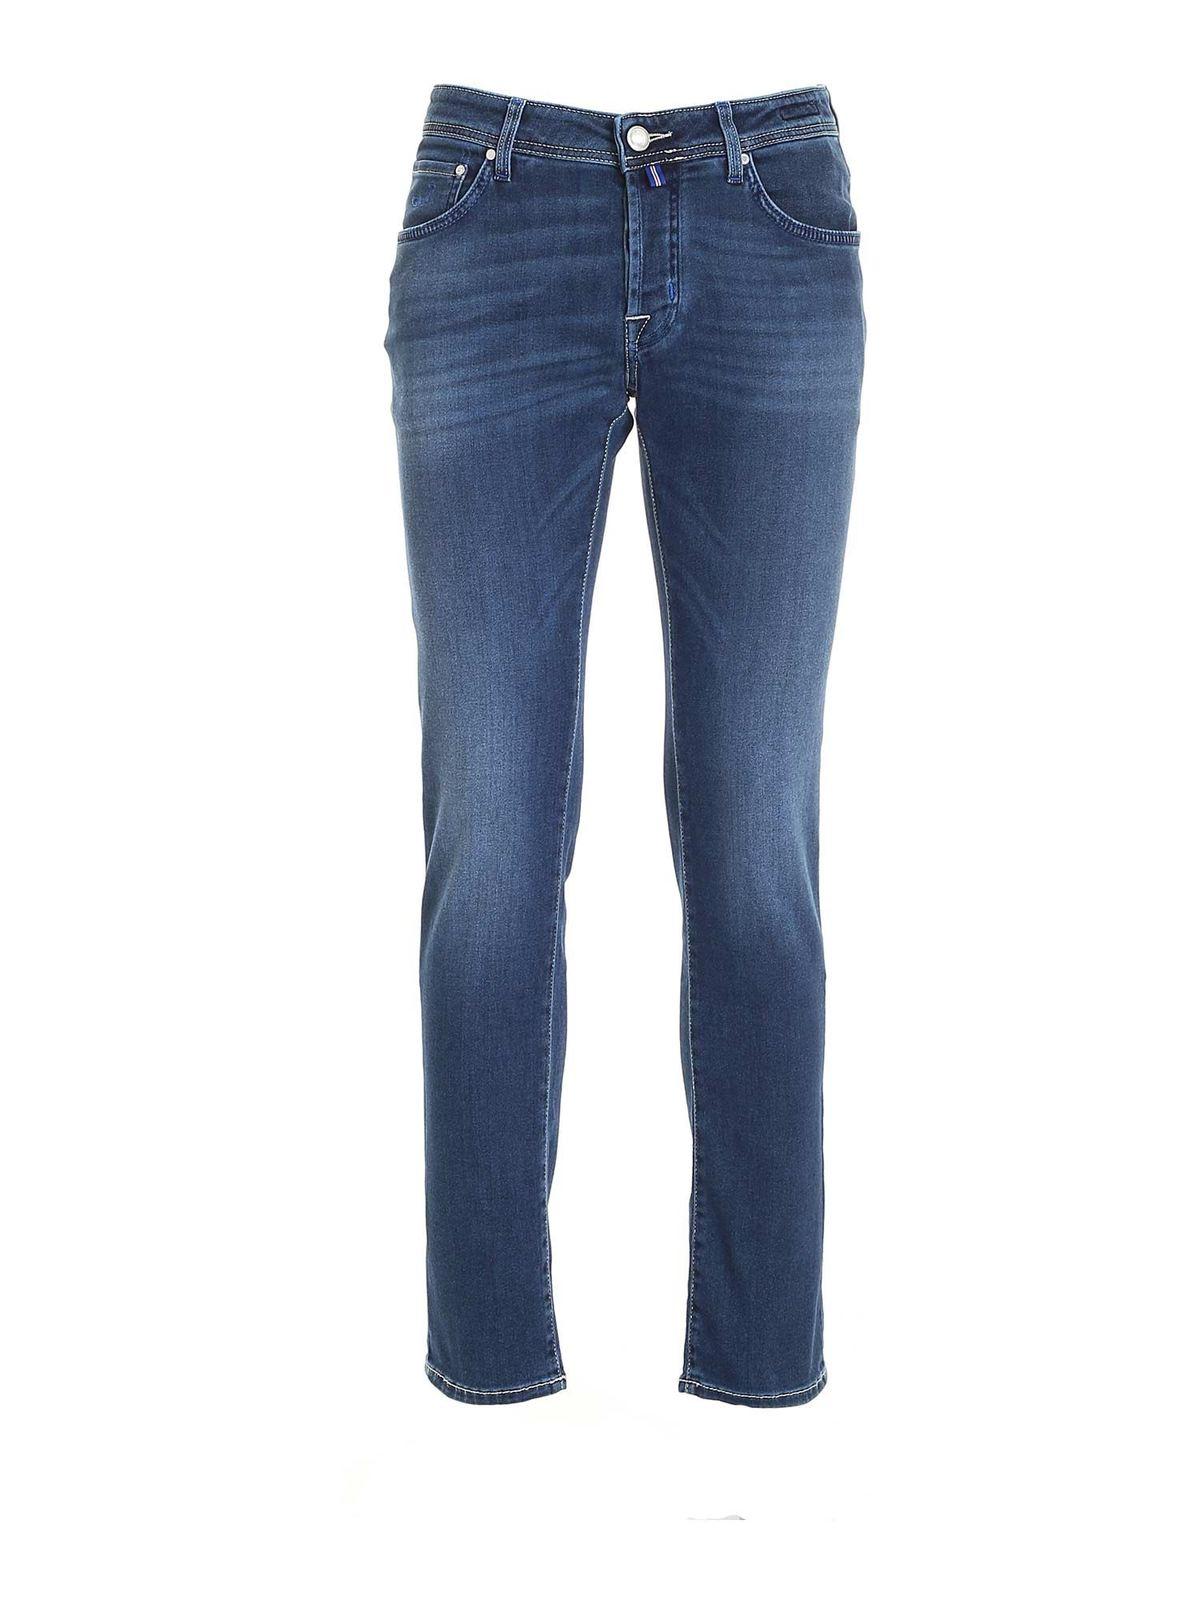 Jacob Cohen Jeans CALFHAIR LOGO JEANS IN BLUE